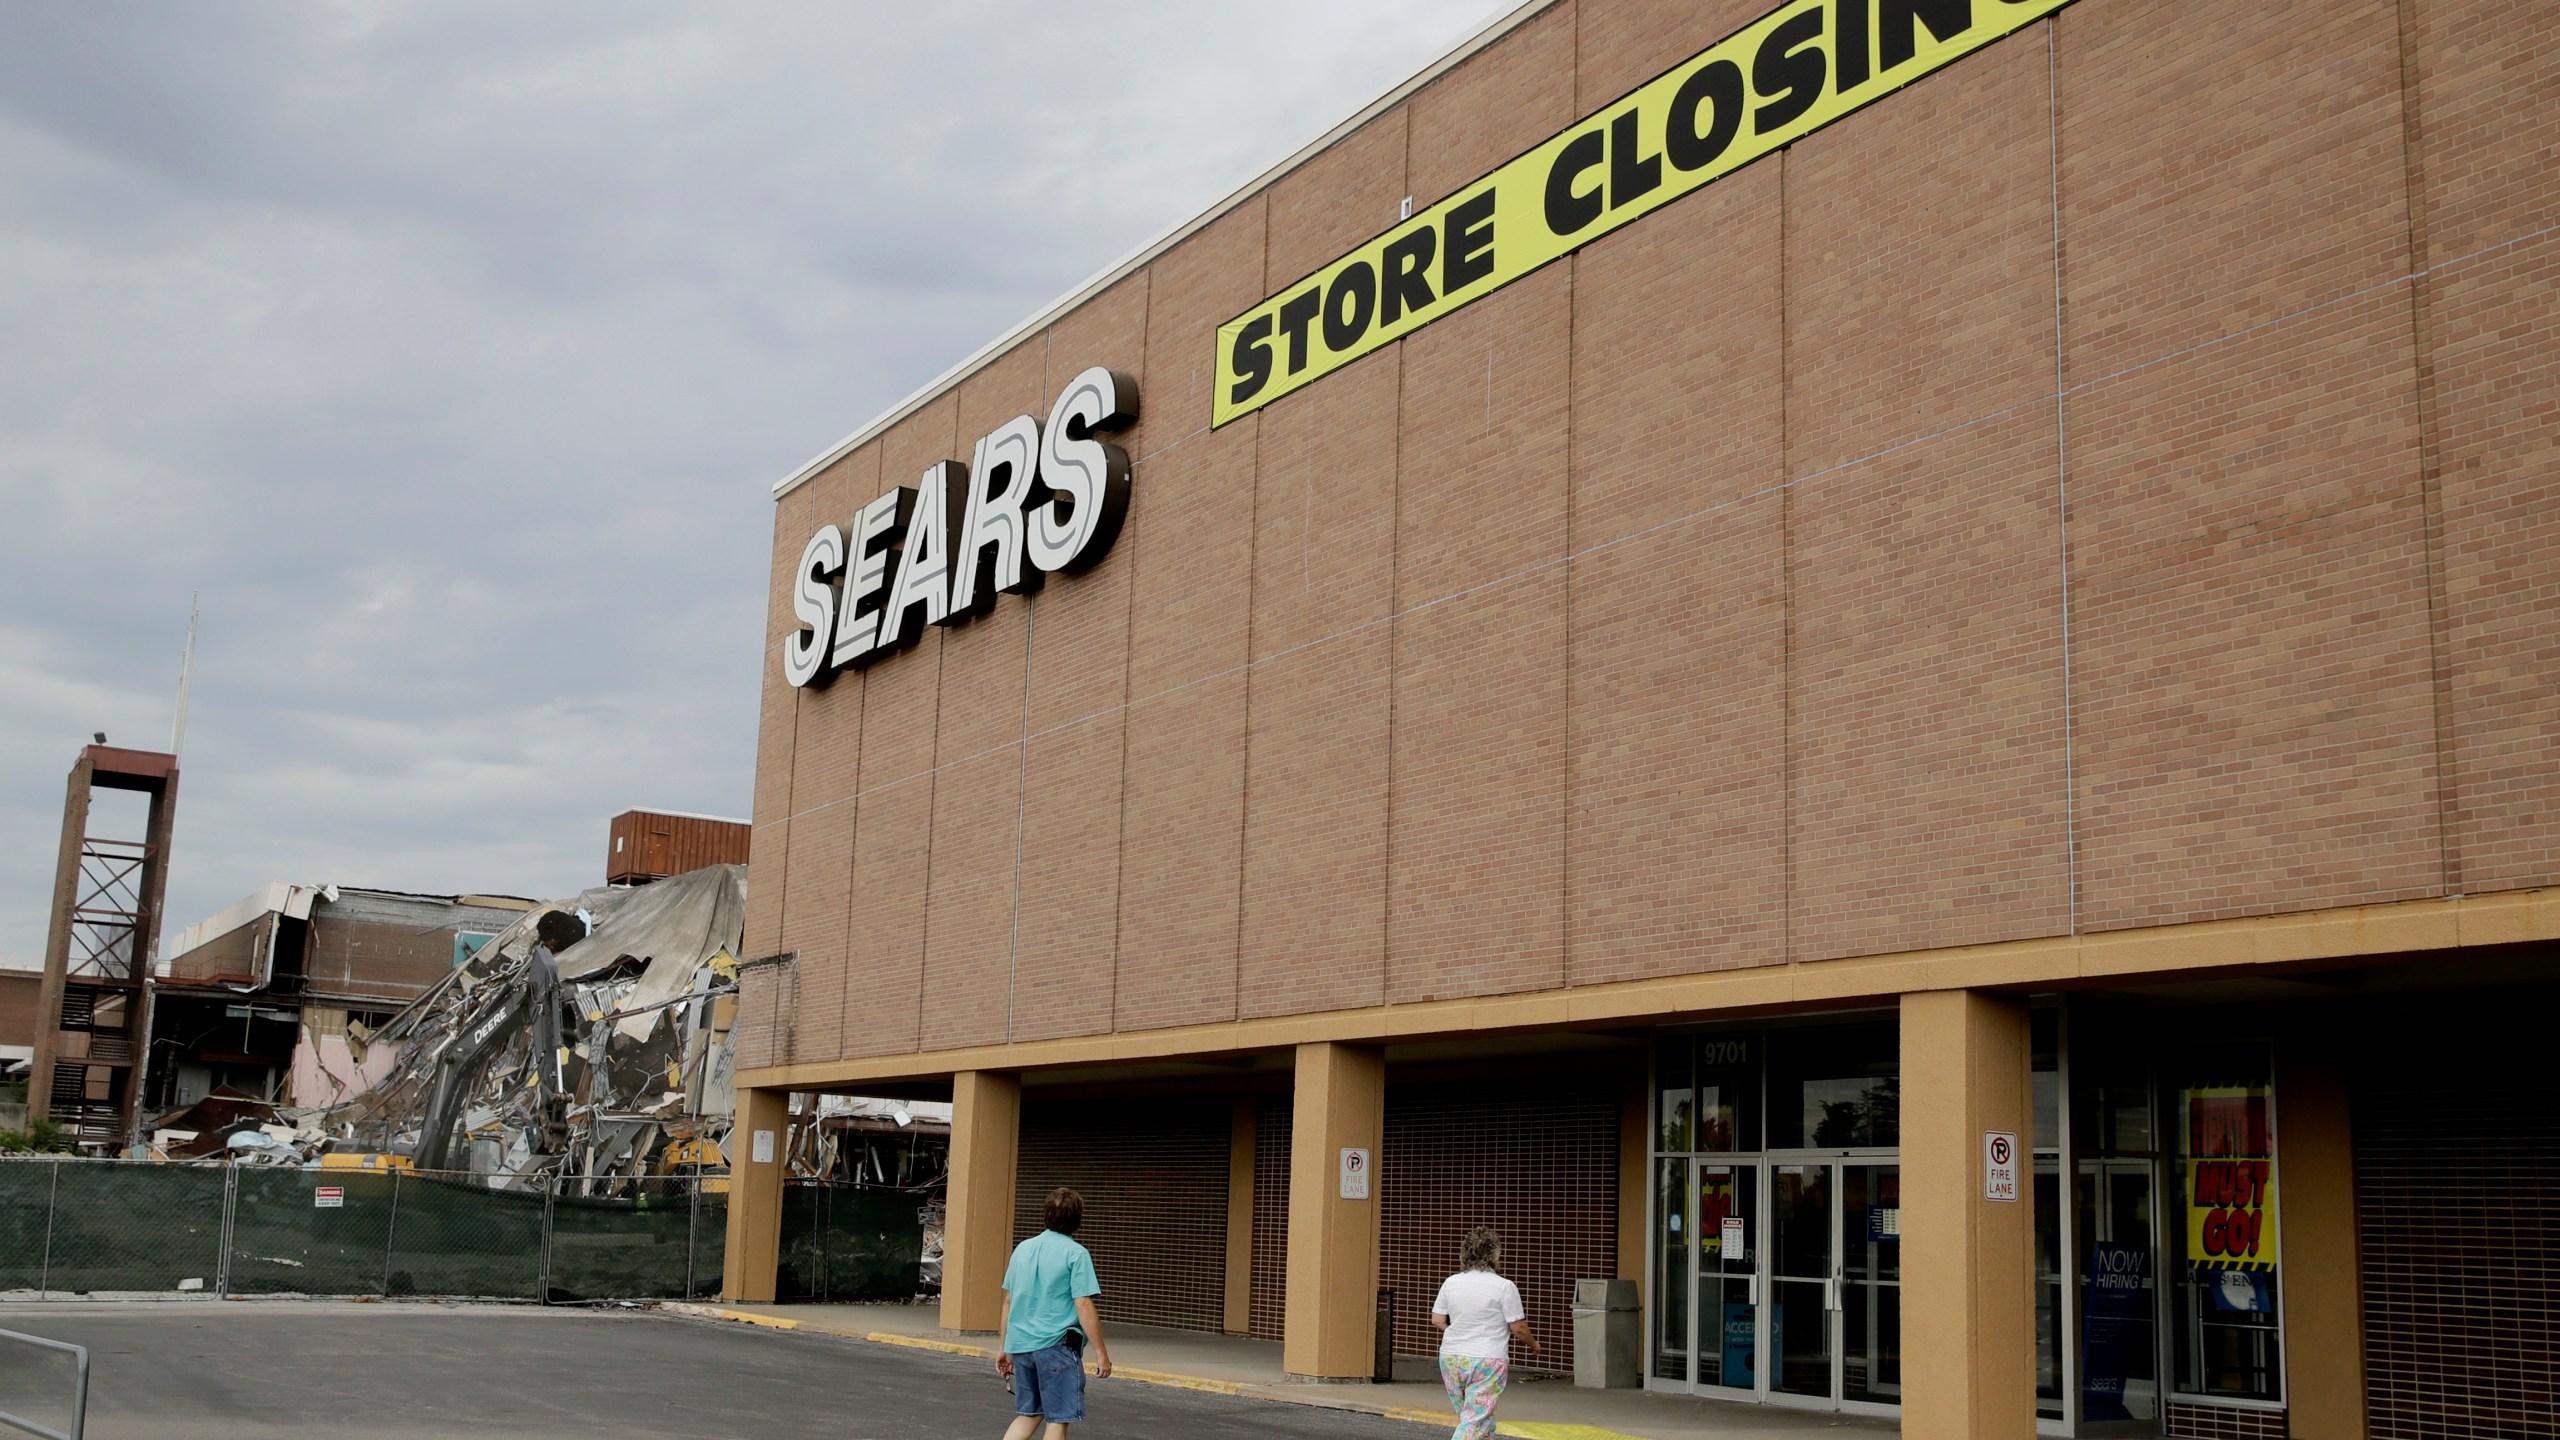 Sears_25780-159532.jpg45122224